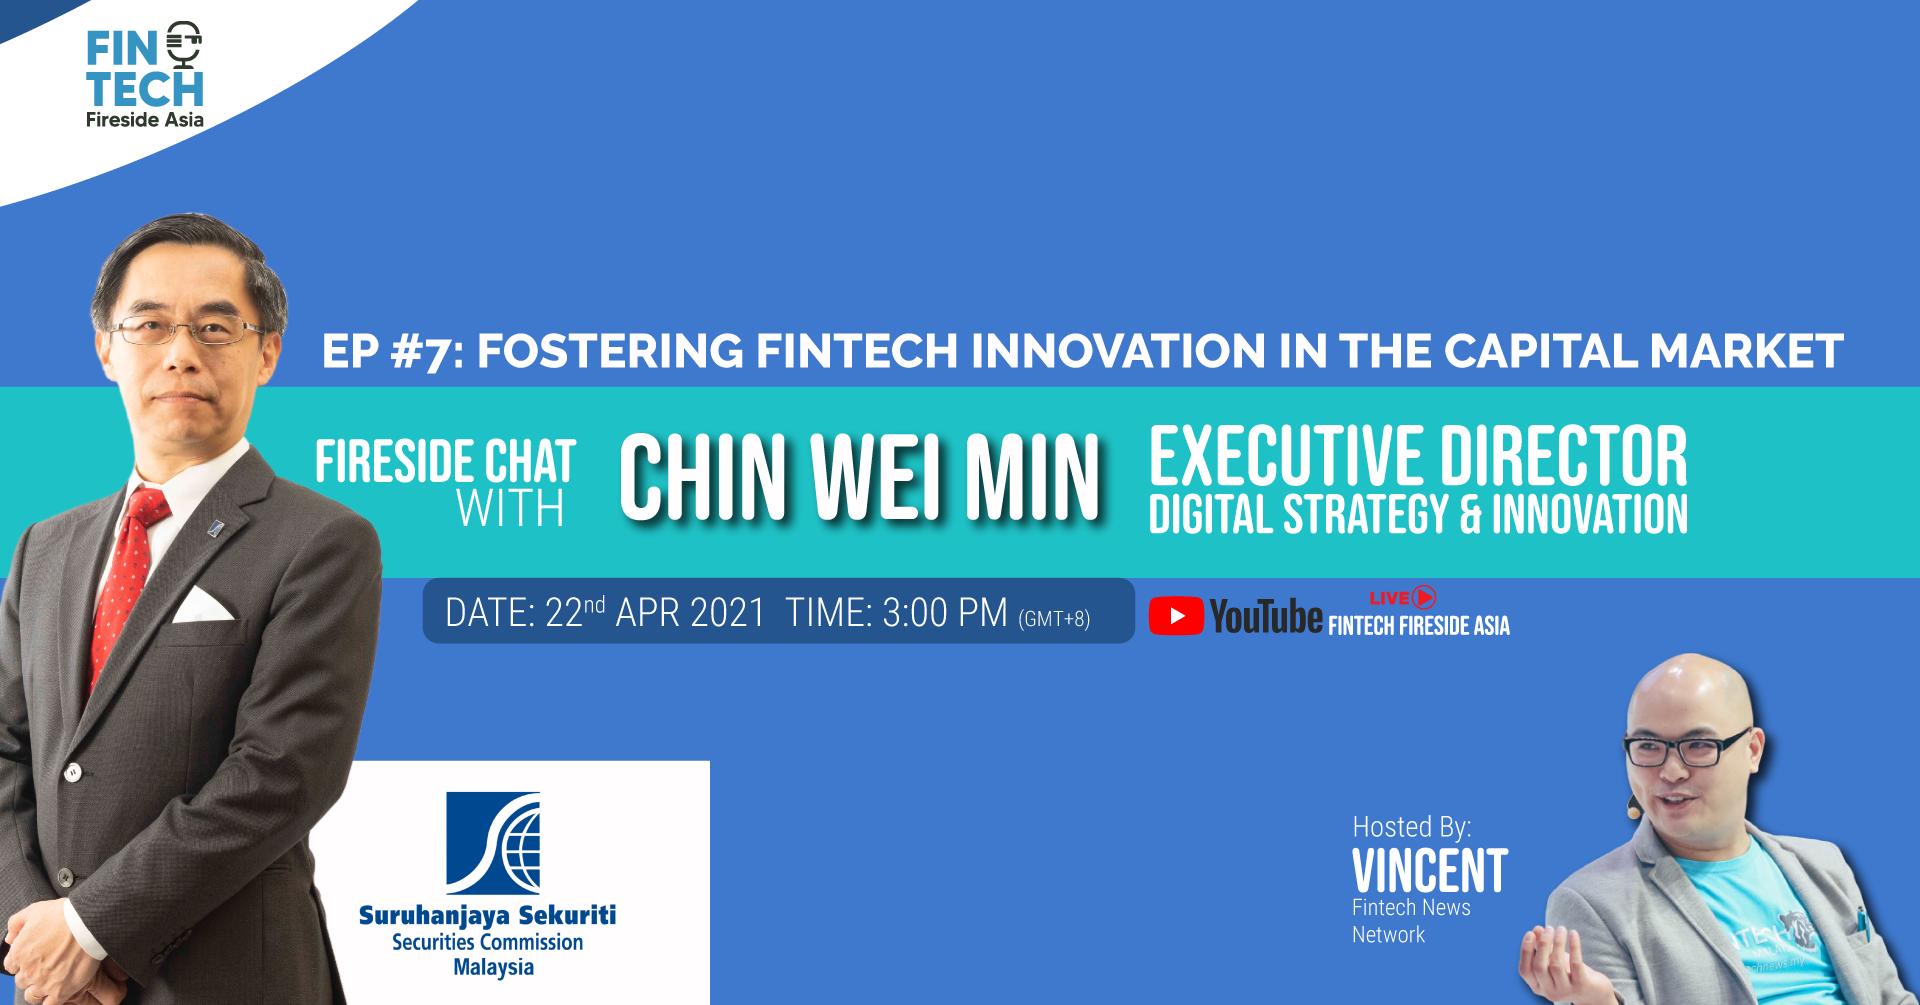 Fintech Fireside Asia Ep #7- Fostering Fintech Innovation in the Capital Market